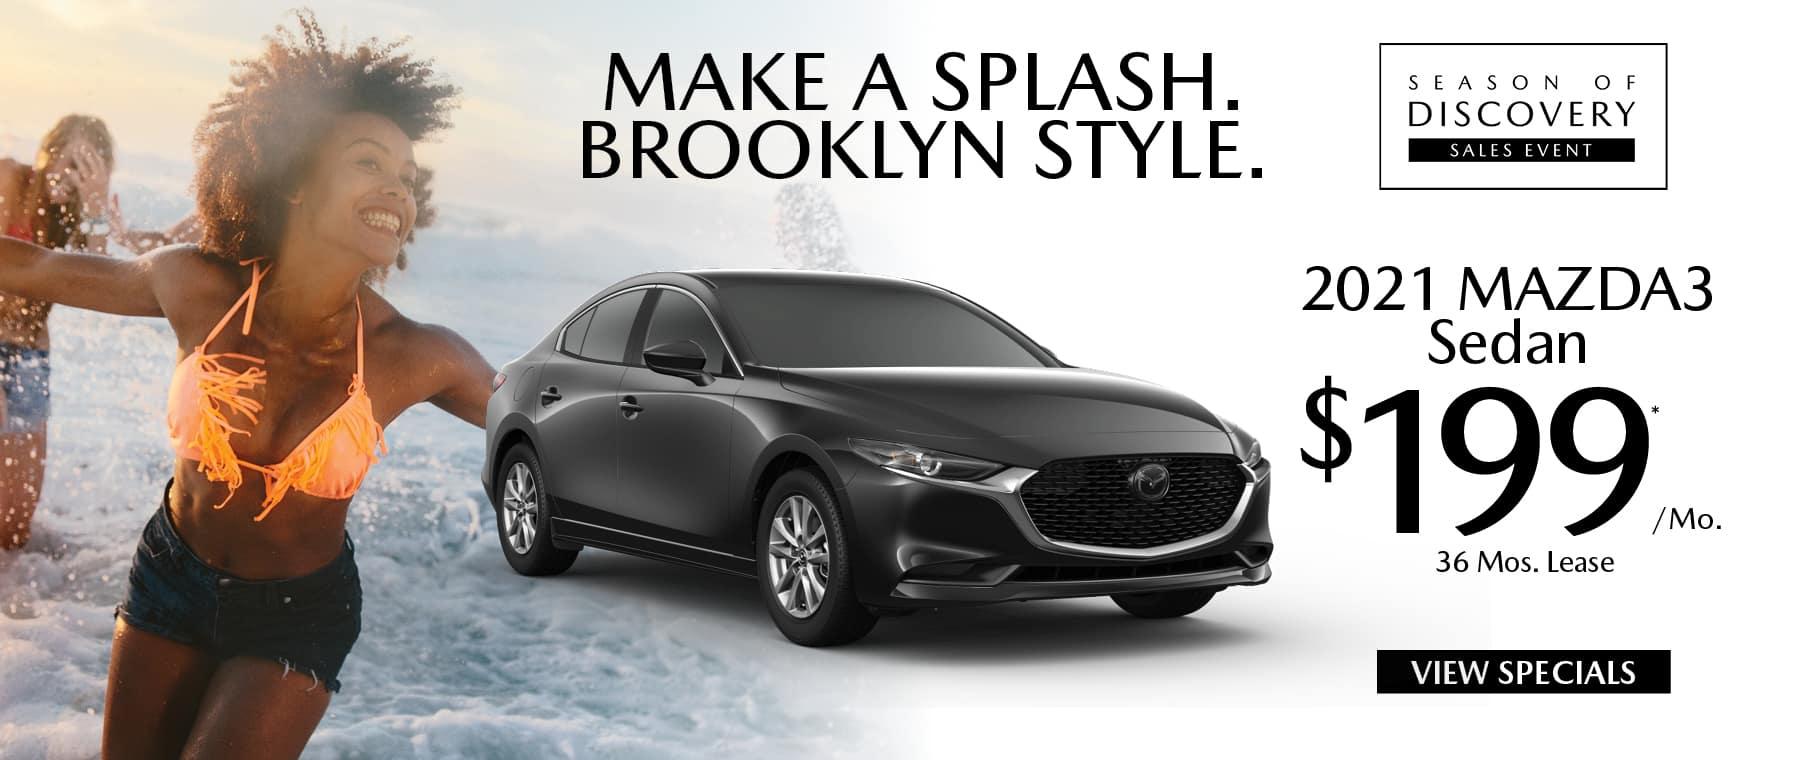 BRMA-1480 Splash 1800x760_Mazda3